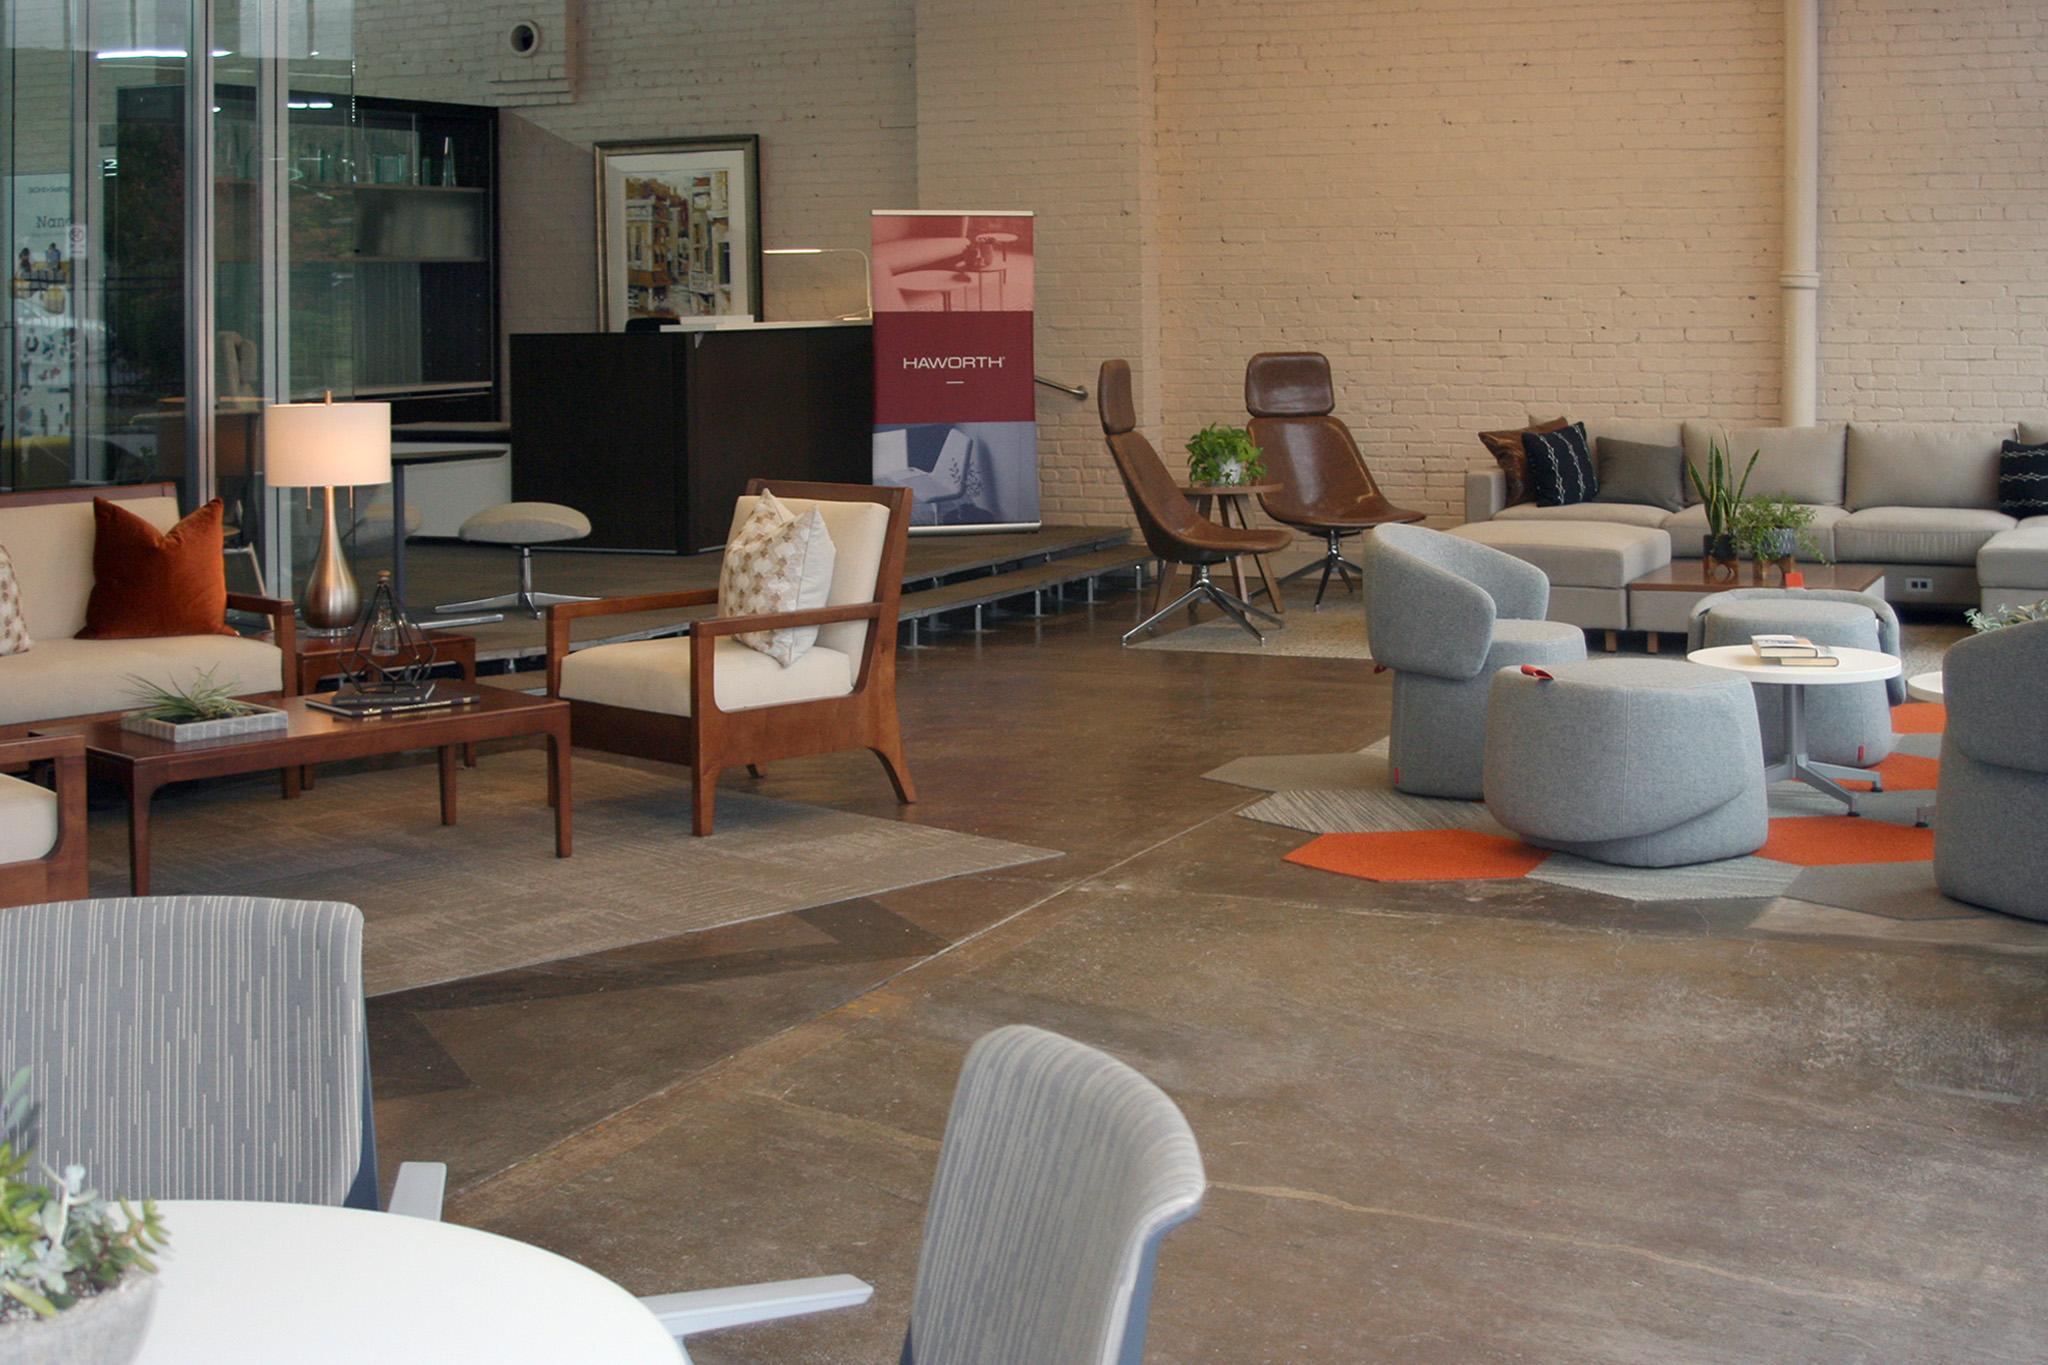 Innerspaice Birmingham Office interior